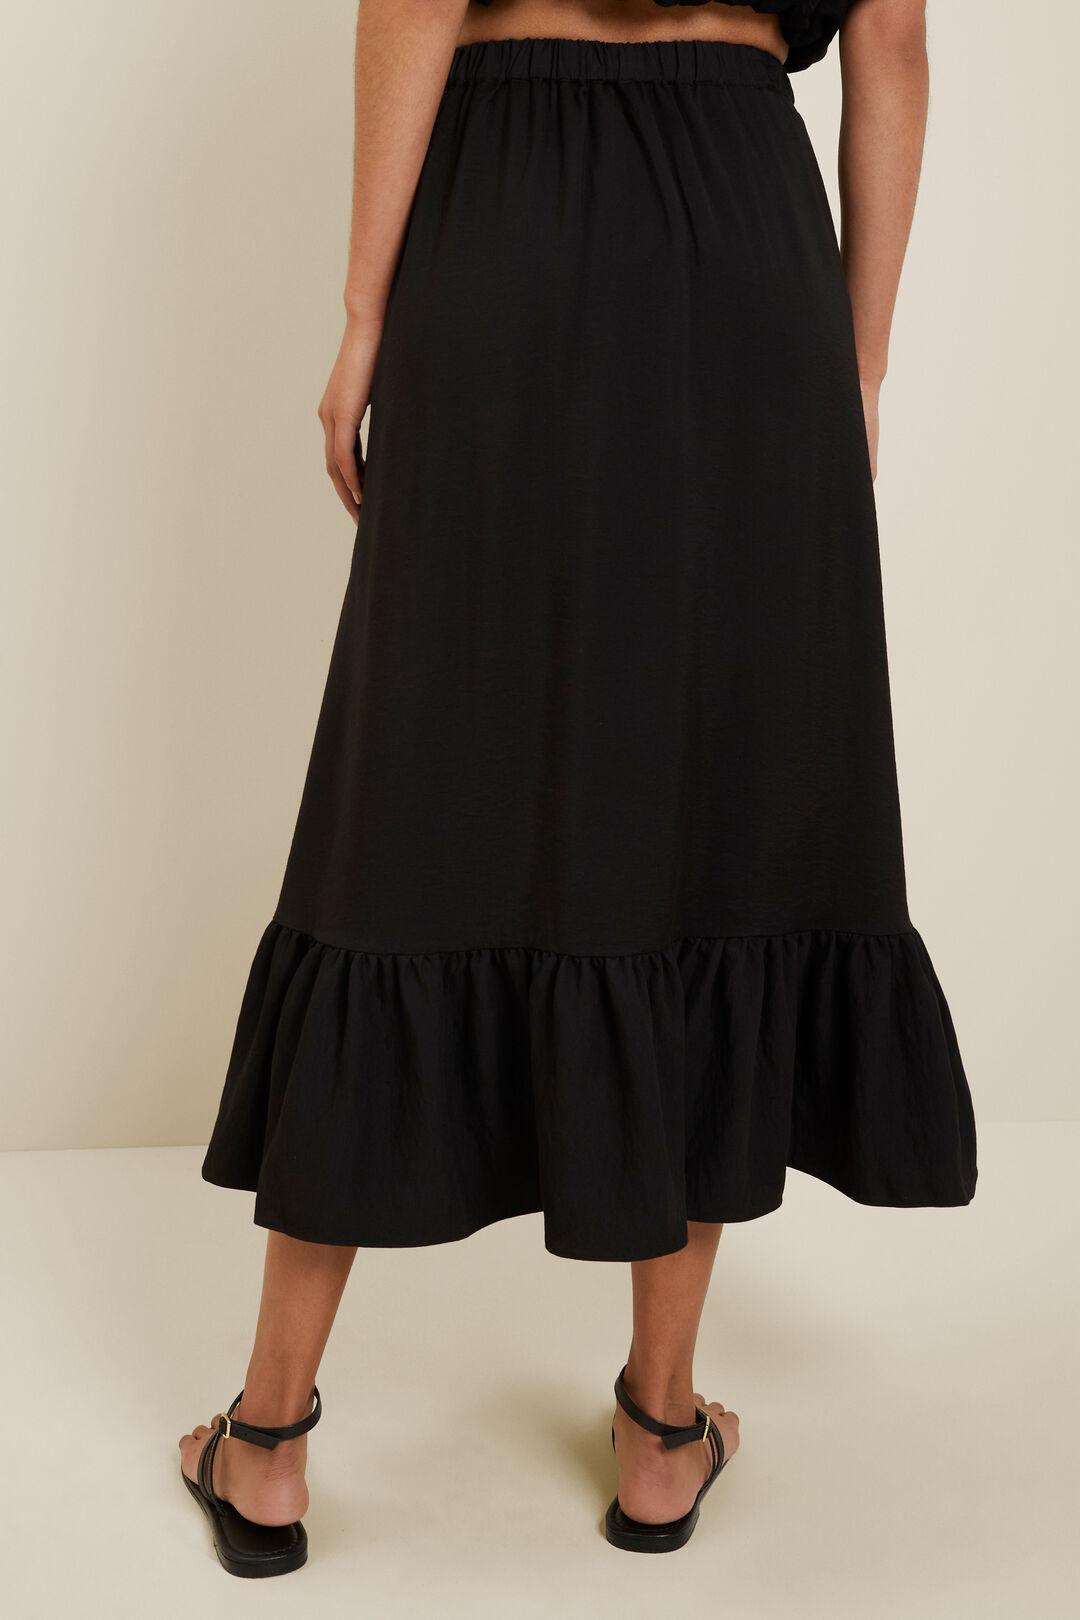 Ruffle Midi Skirt  Black  hi-res